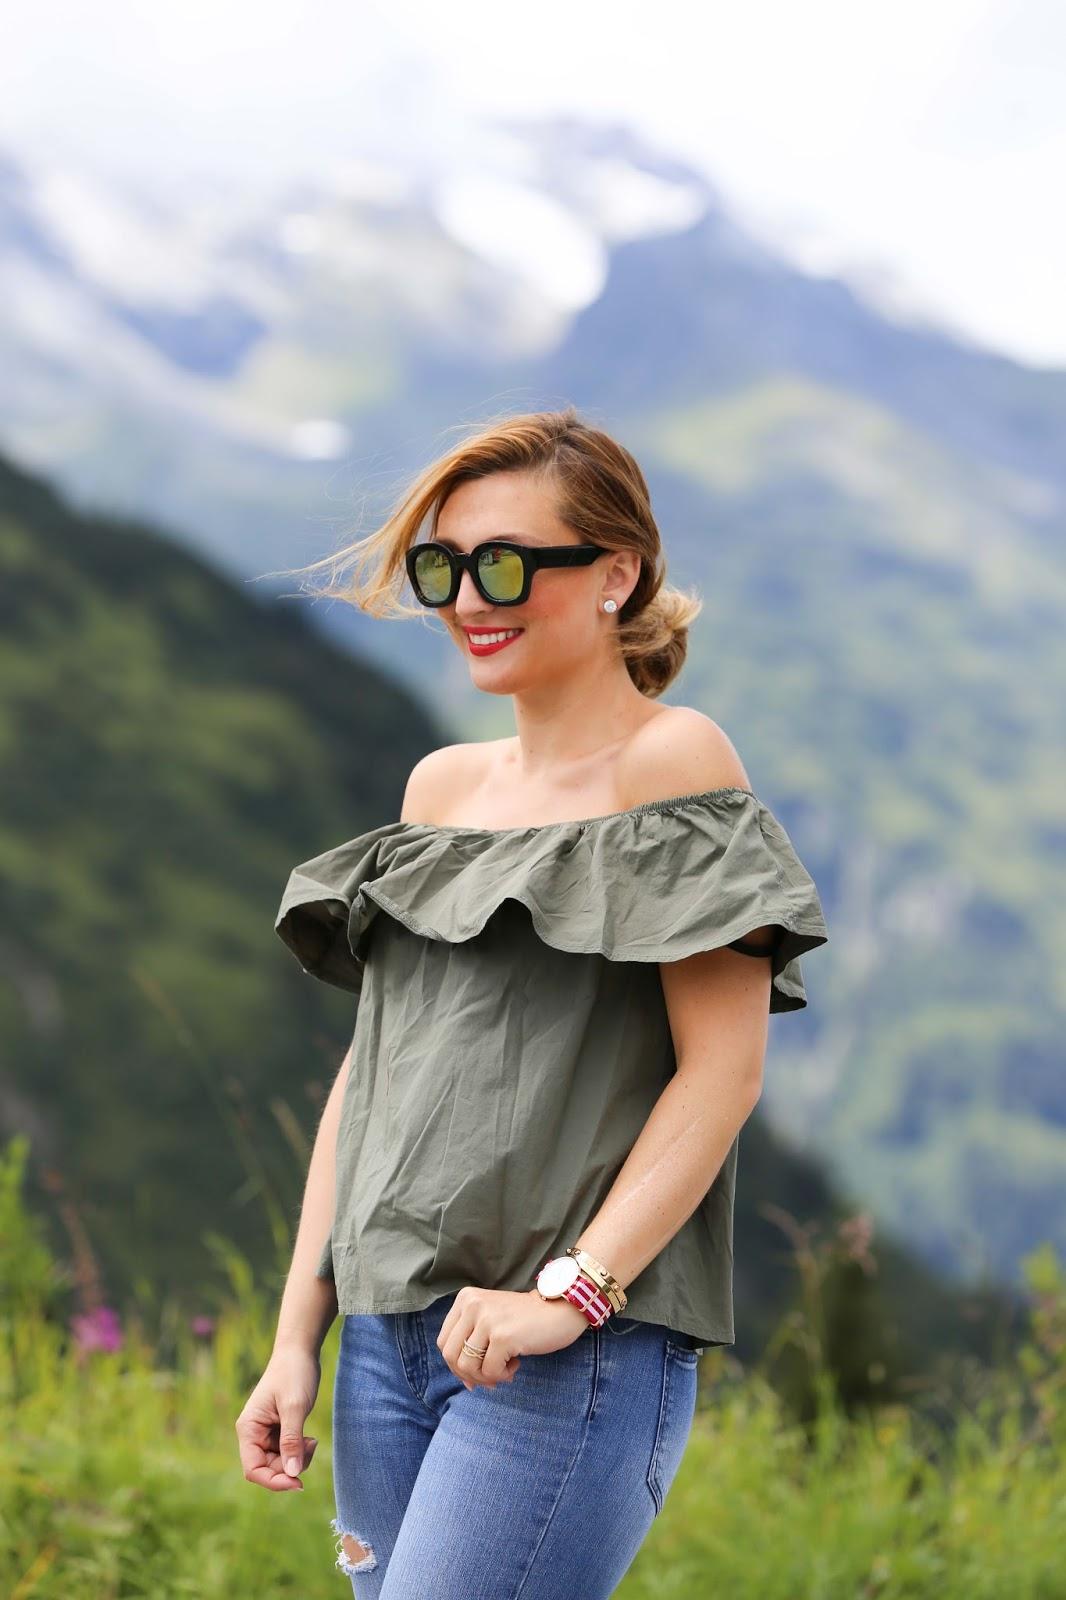 fashionblog-muenchen-styleblog-Frankfurth-blogger-deutschland-fashionblogger-bloggerdeutschland-Fashionstylebyjohanna - Sheinside Look -lifestyleblog-modeblog-germanblogger-Off Shoulder Khaki